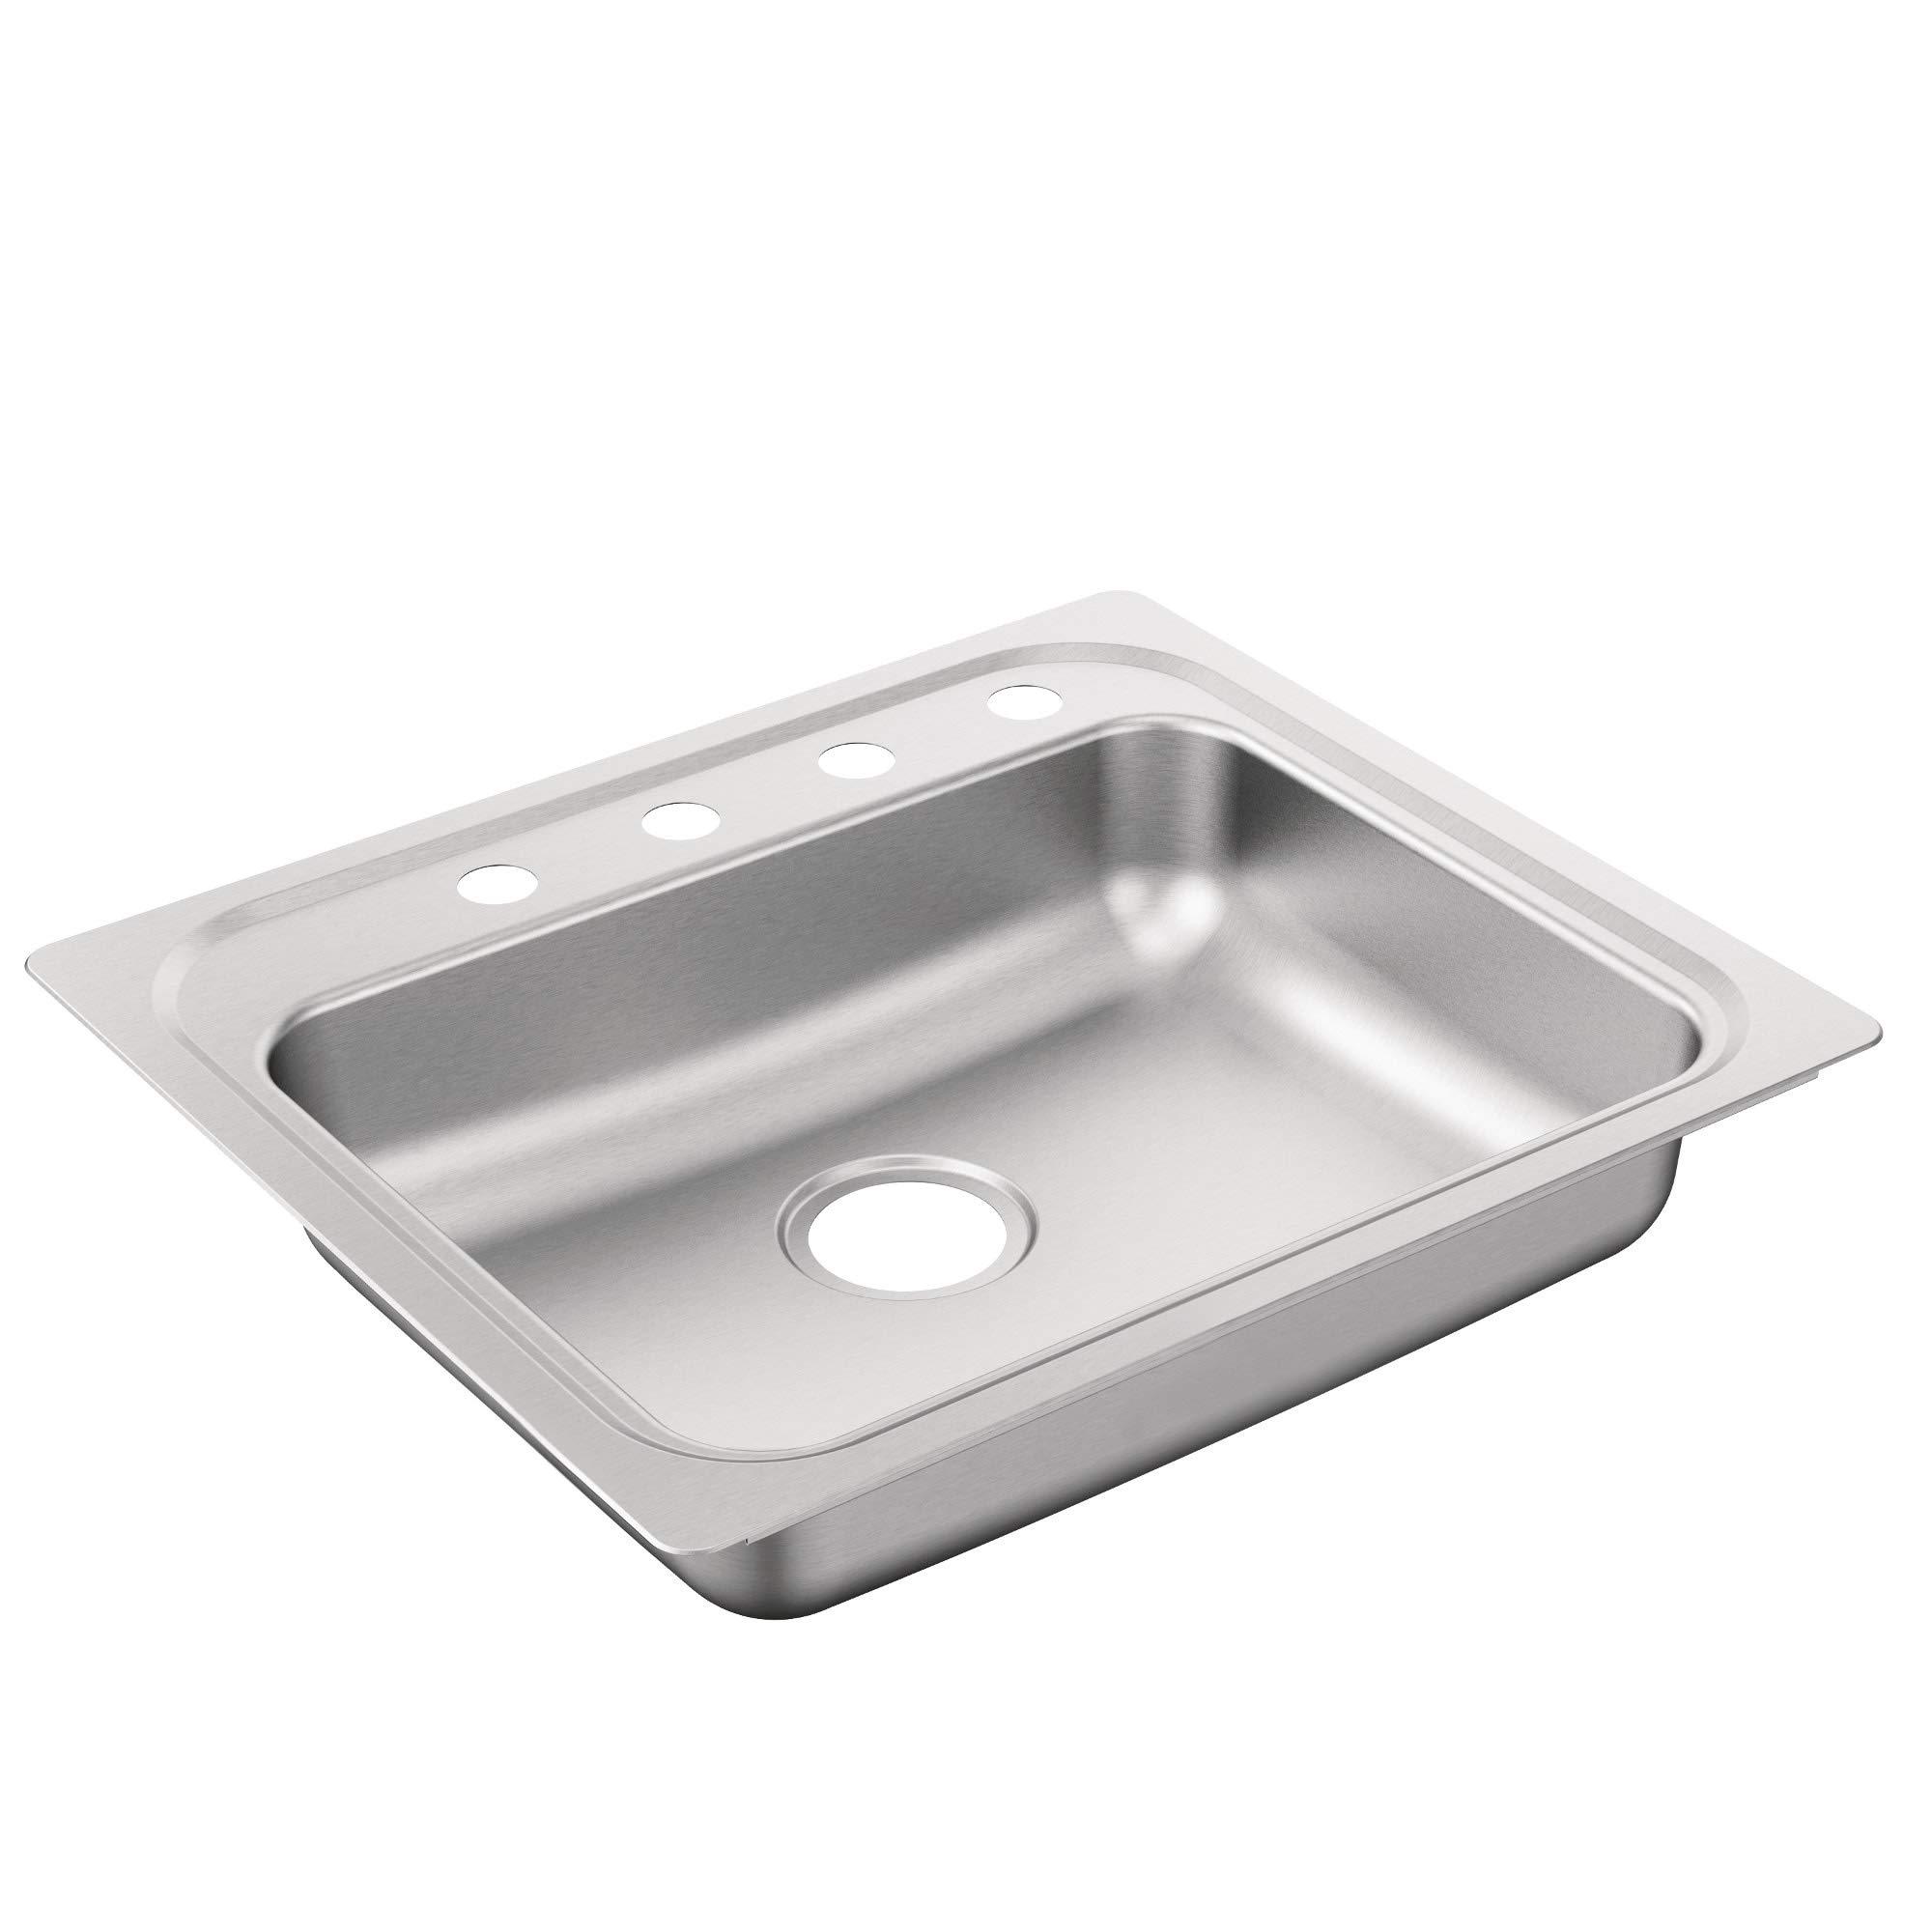 Moen G221204B 2200 Series Sink, Brushed/Satin Stainless